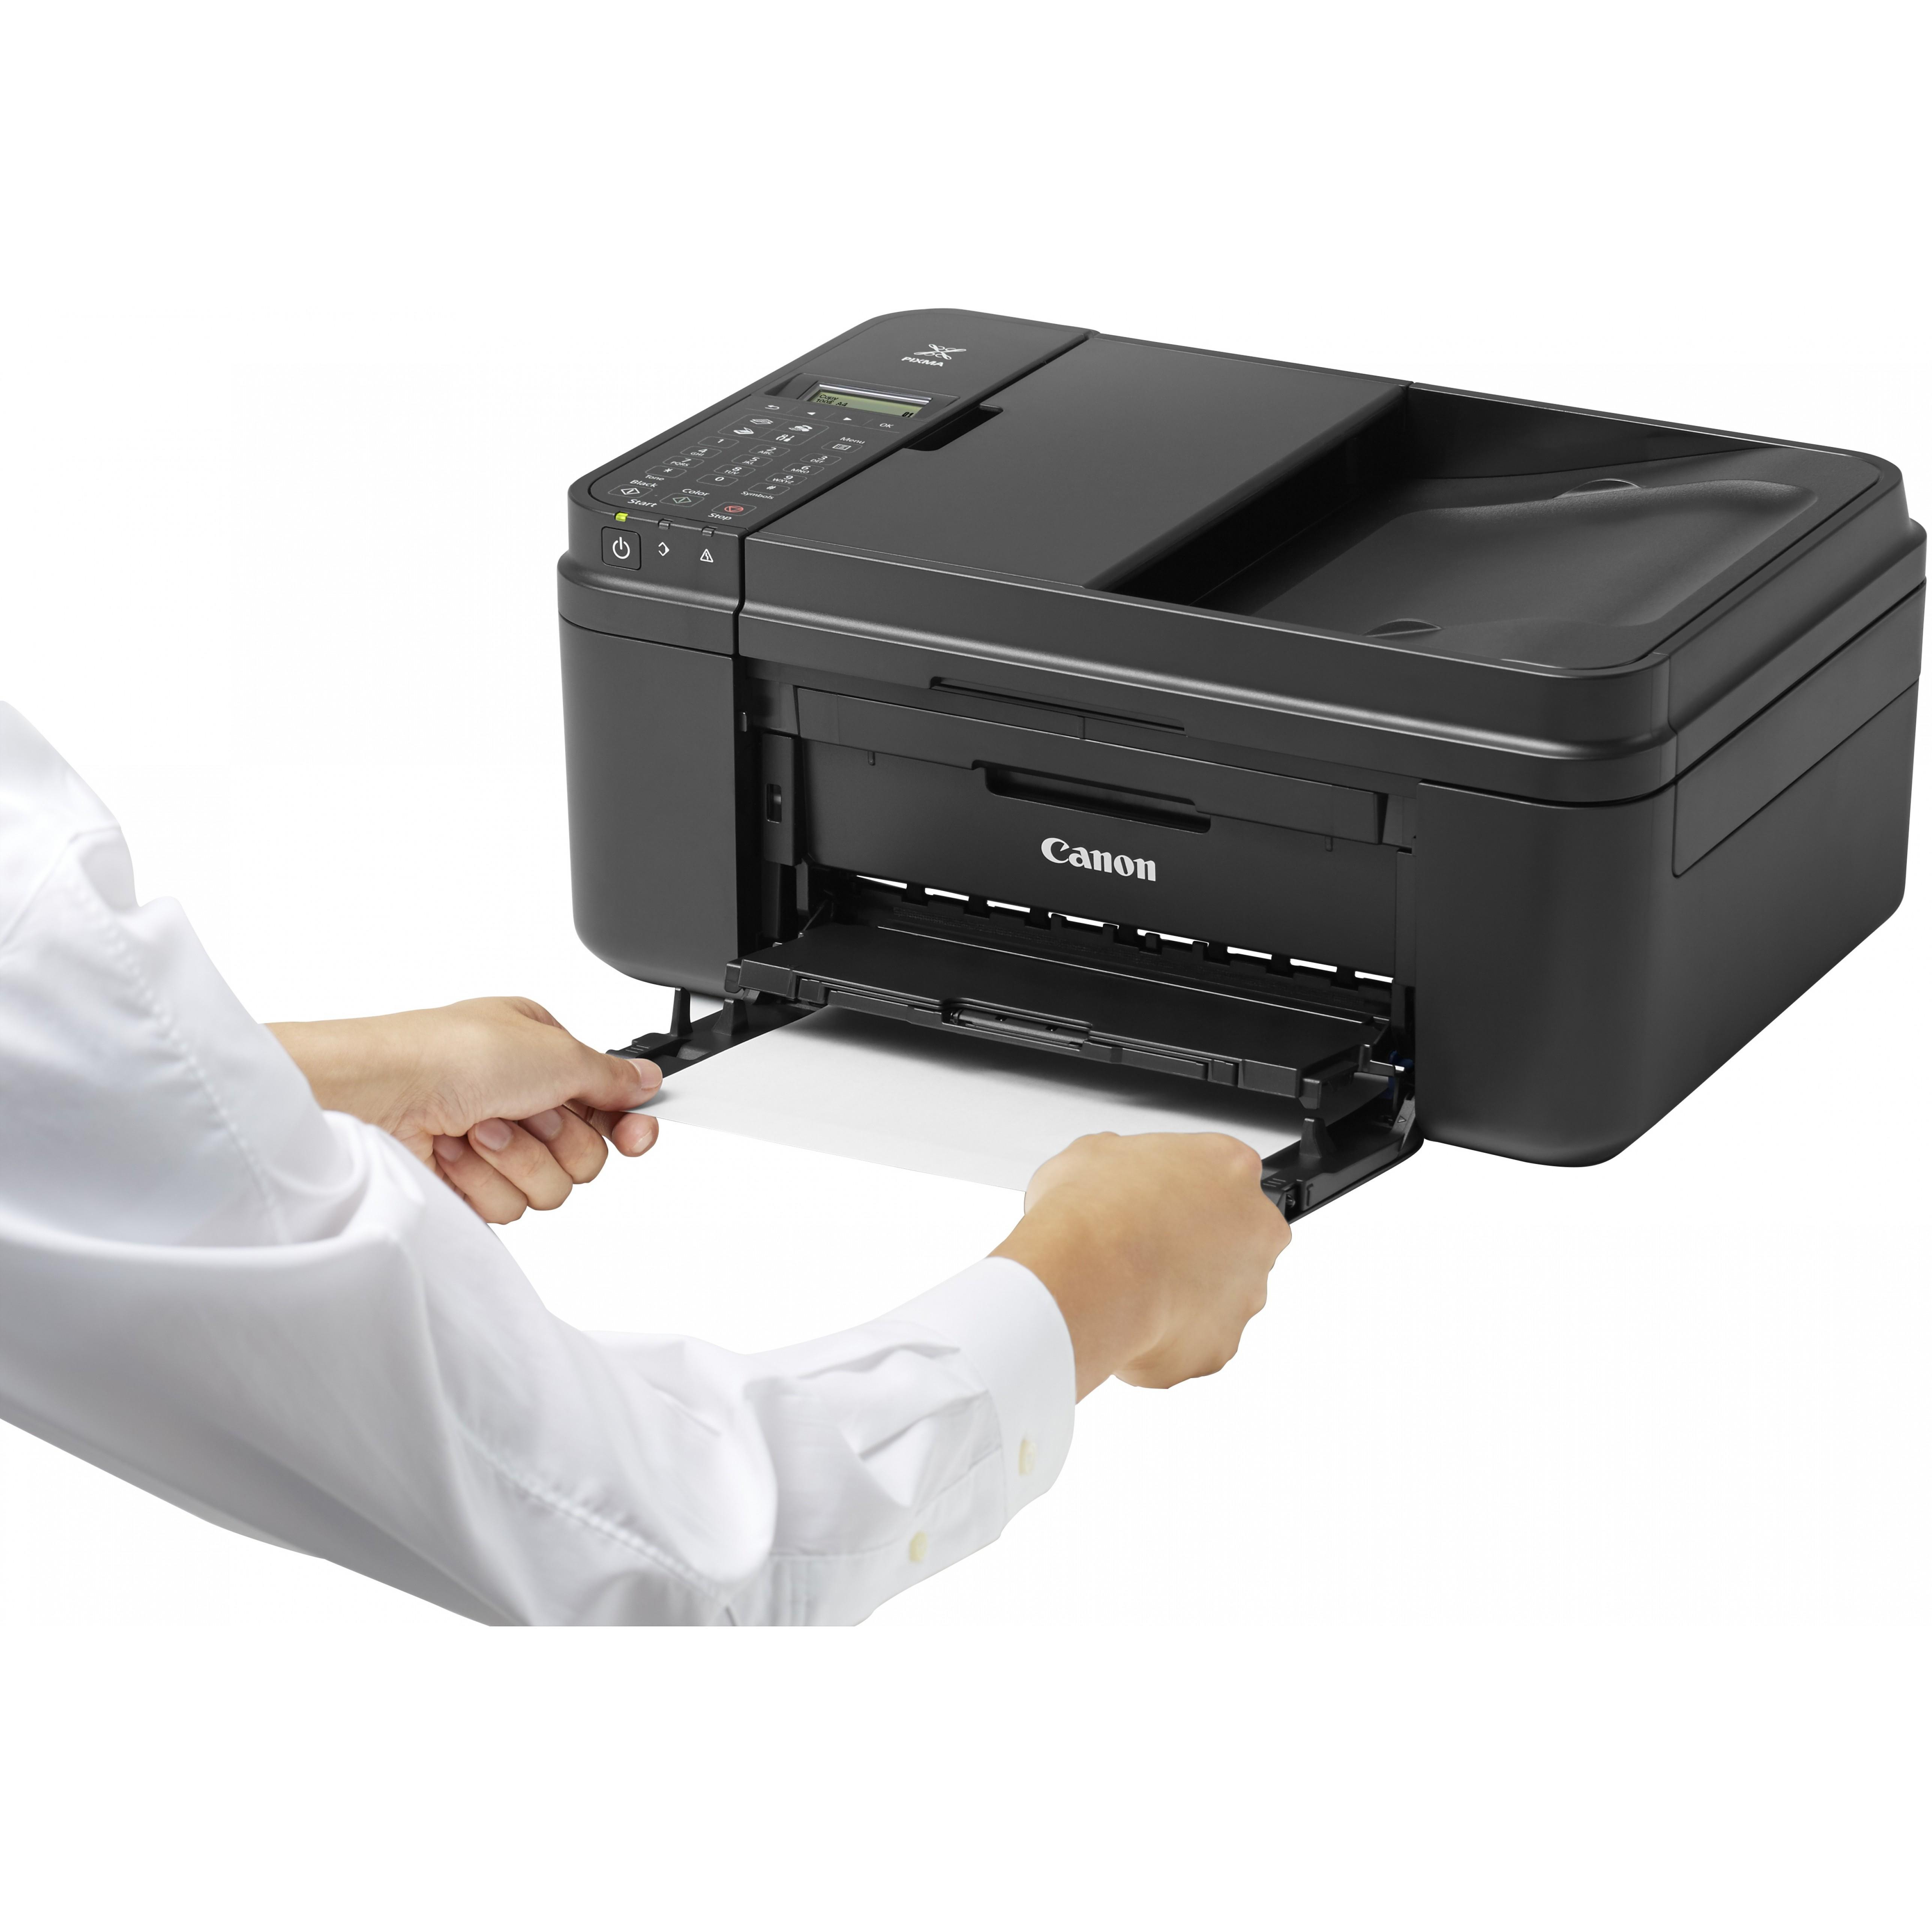 canon pixma mx495 inkjet multifunction printer colored 4 4 ppm usb usb 2 0. Black Bedroom Furniture Sets. Home Design Ideas